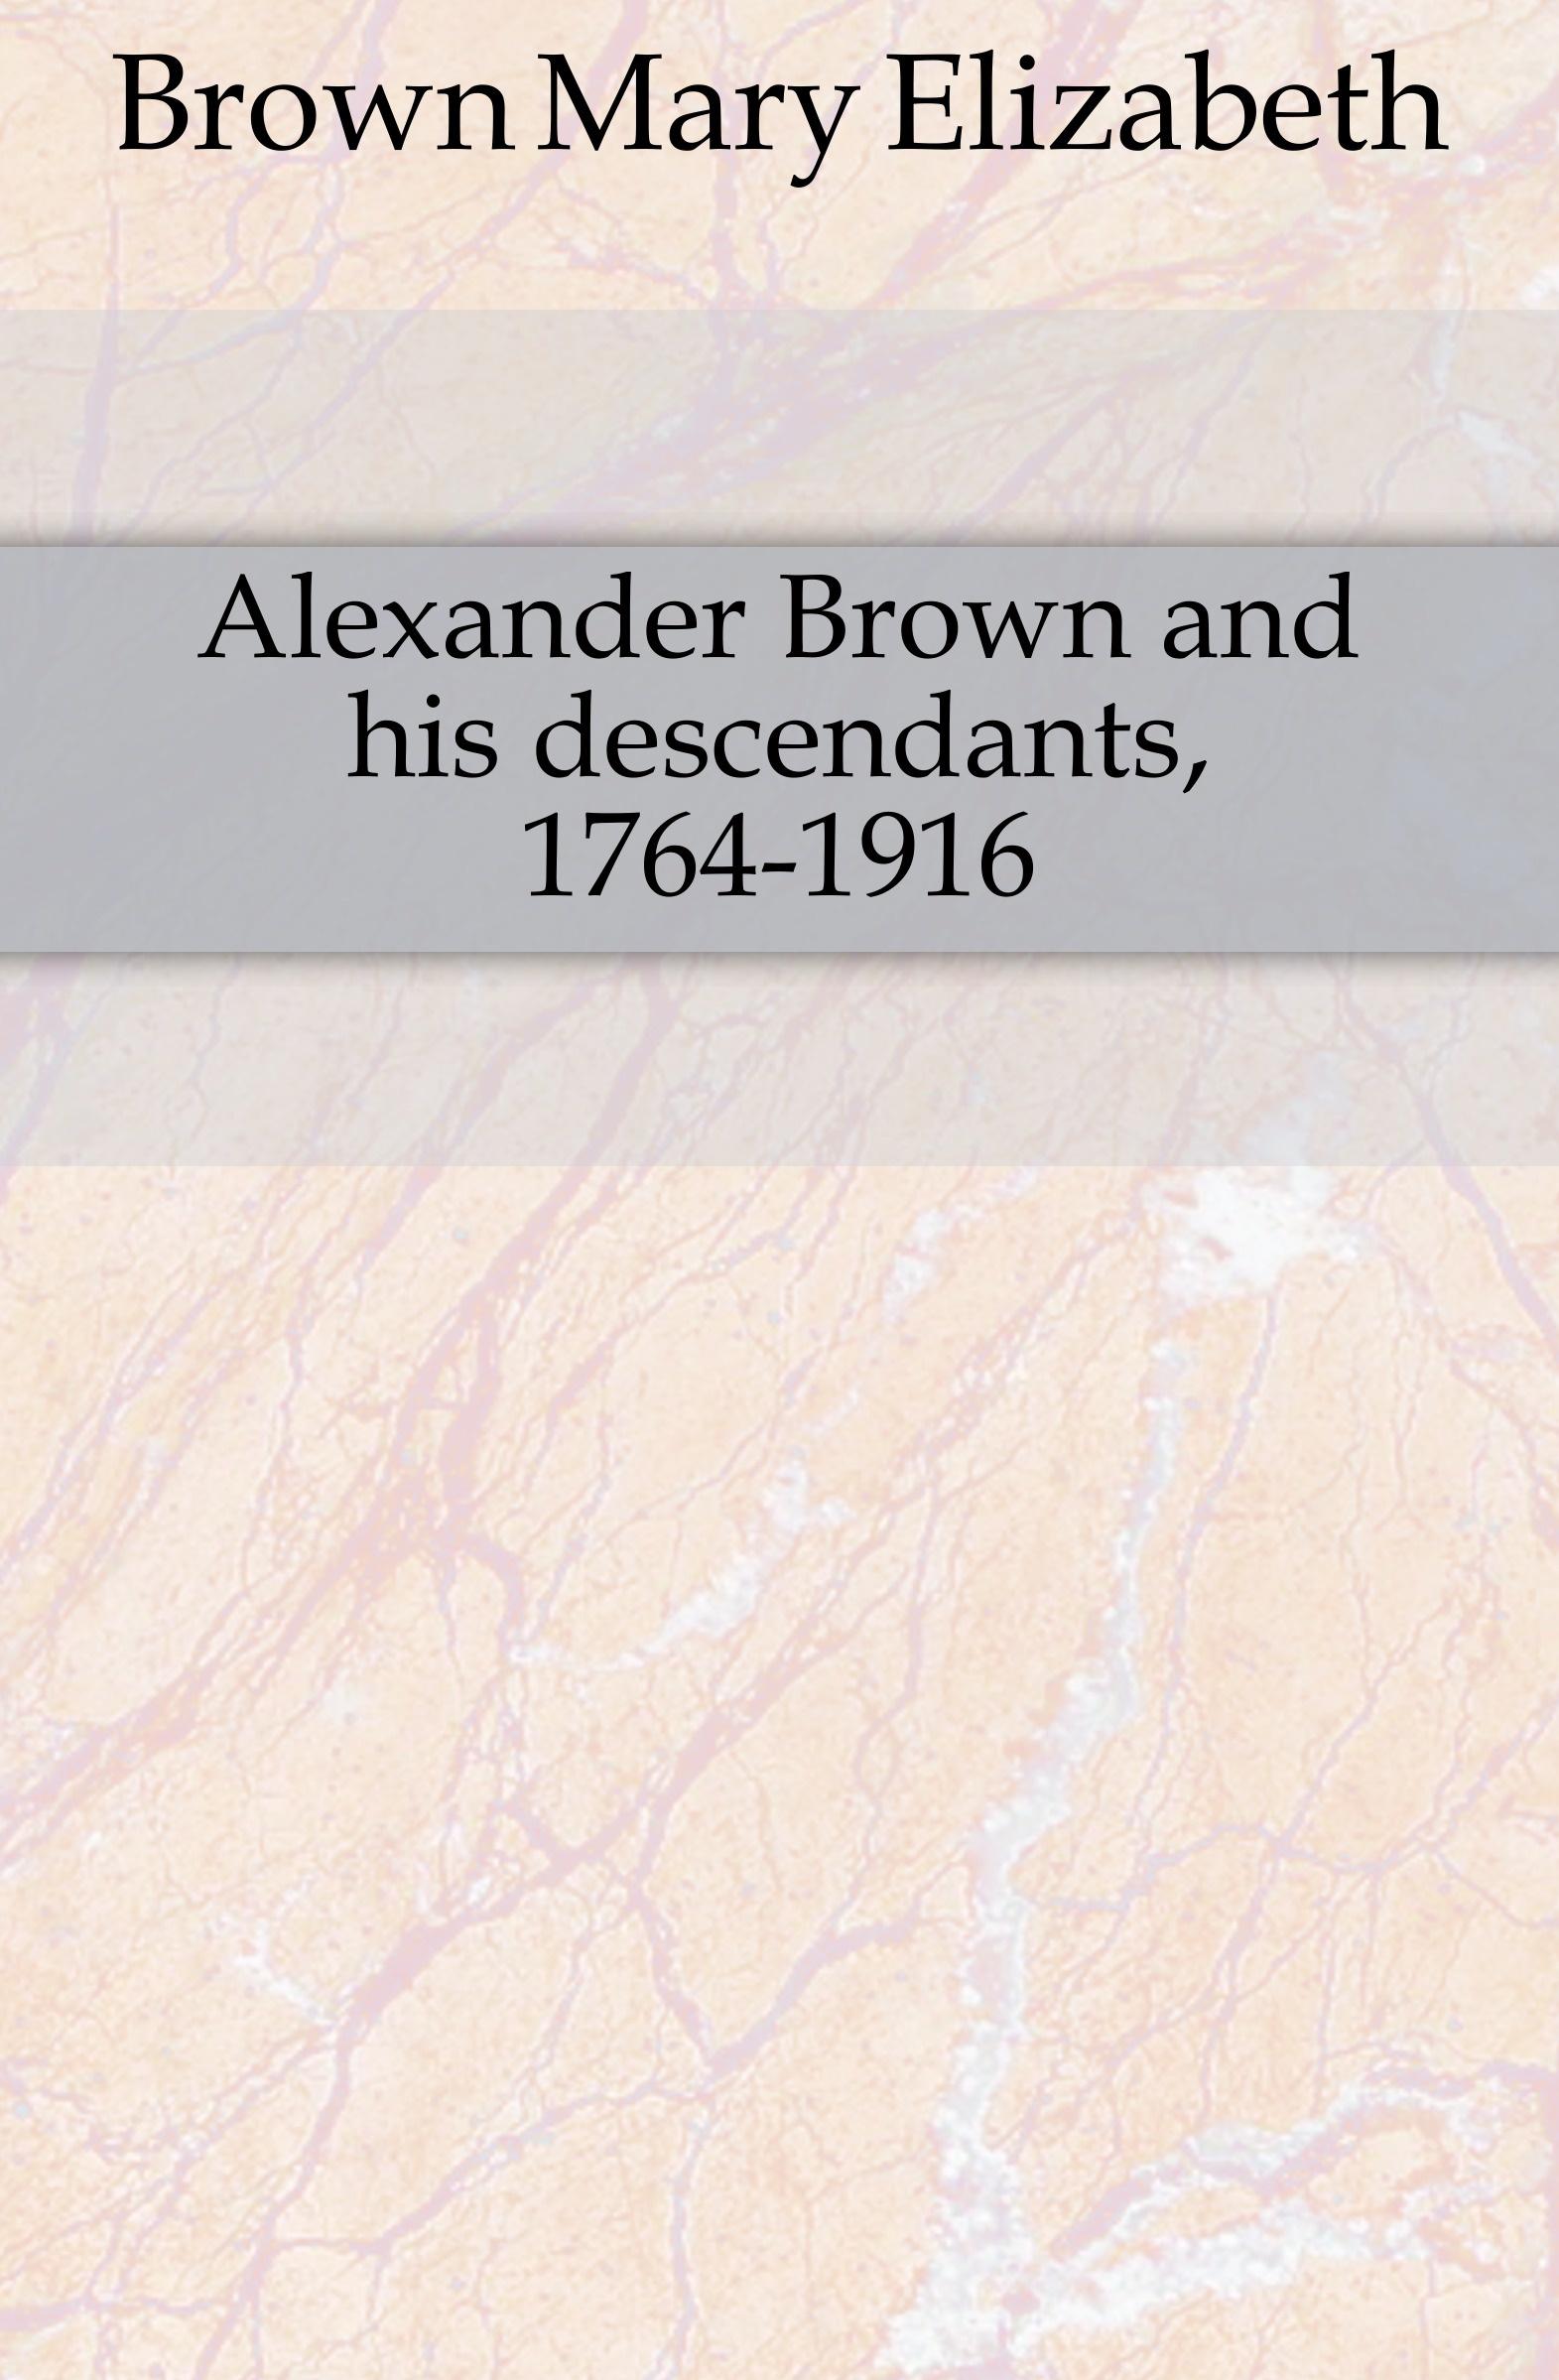 Brown Mary Elizabeth Alexander Brown and his descendants, 1764-1916 emma elizabeth brown huldah